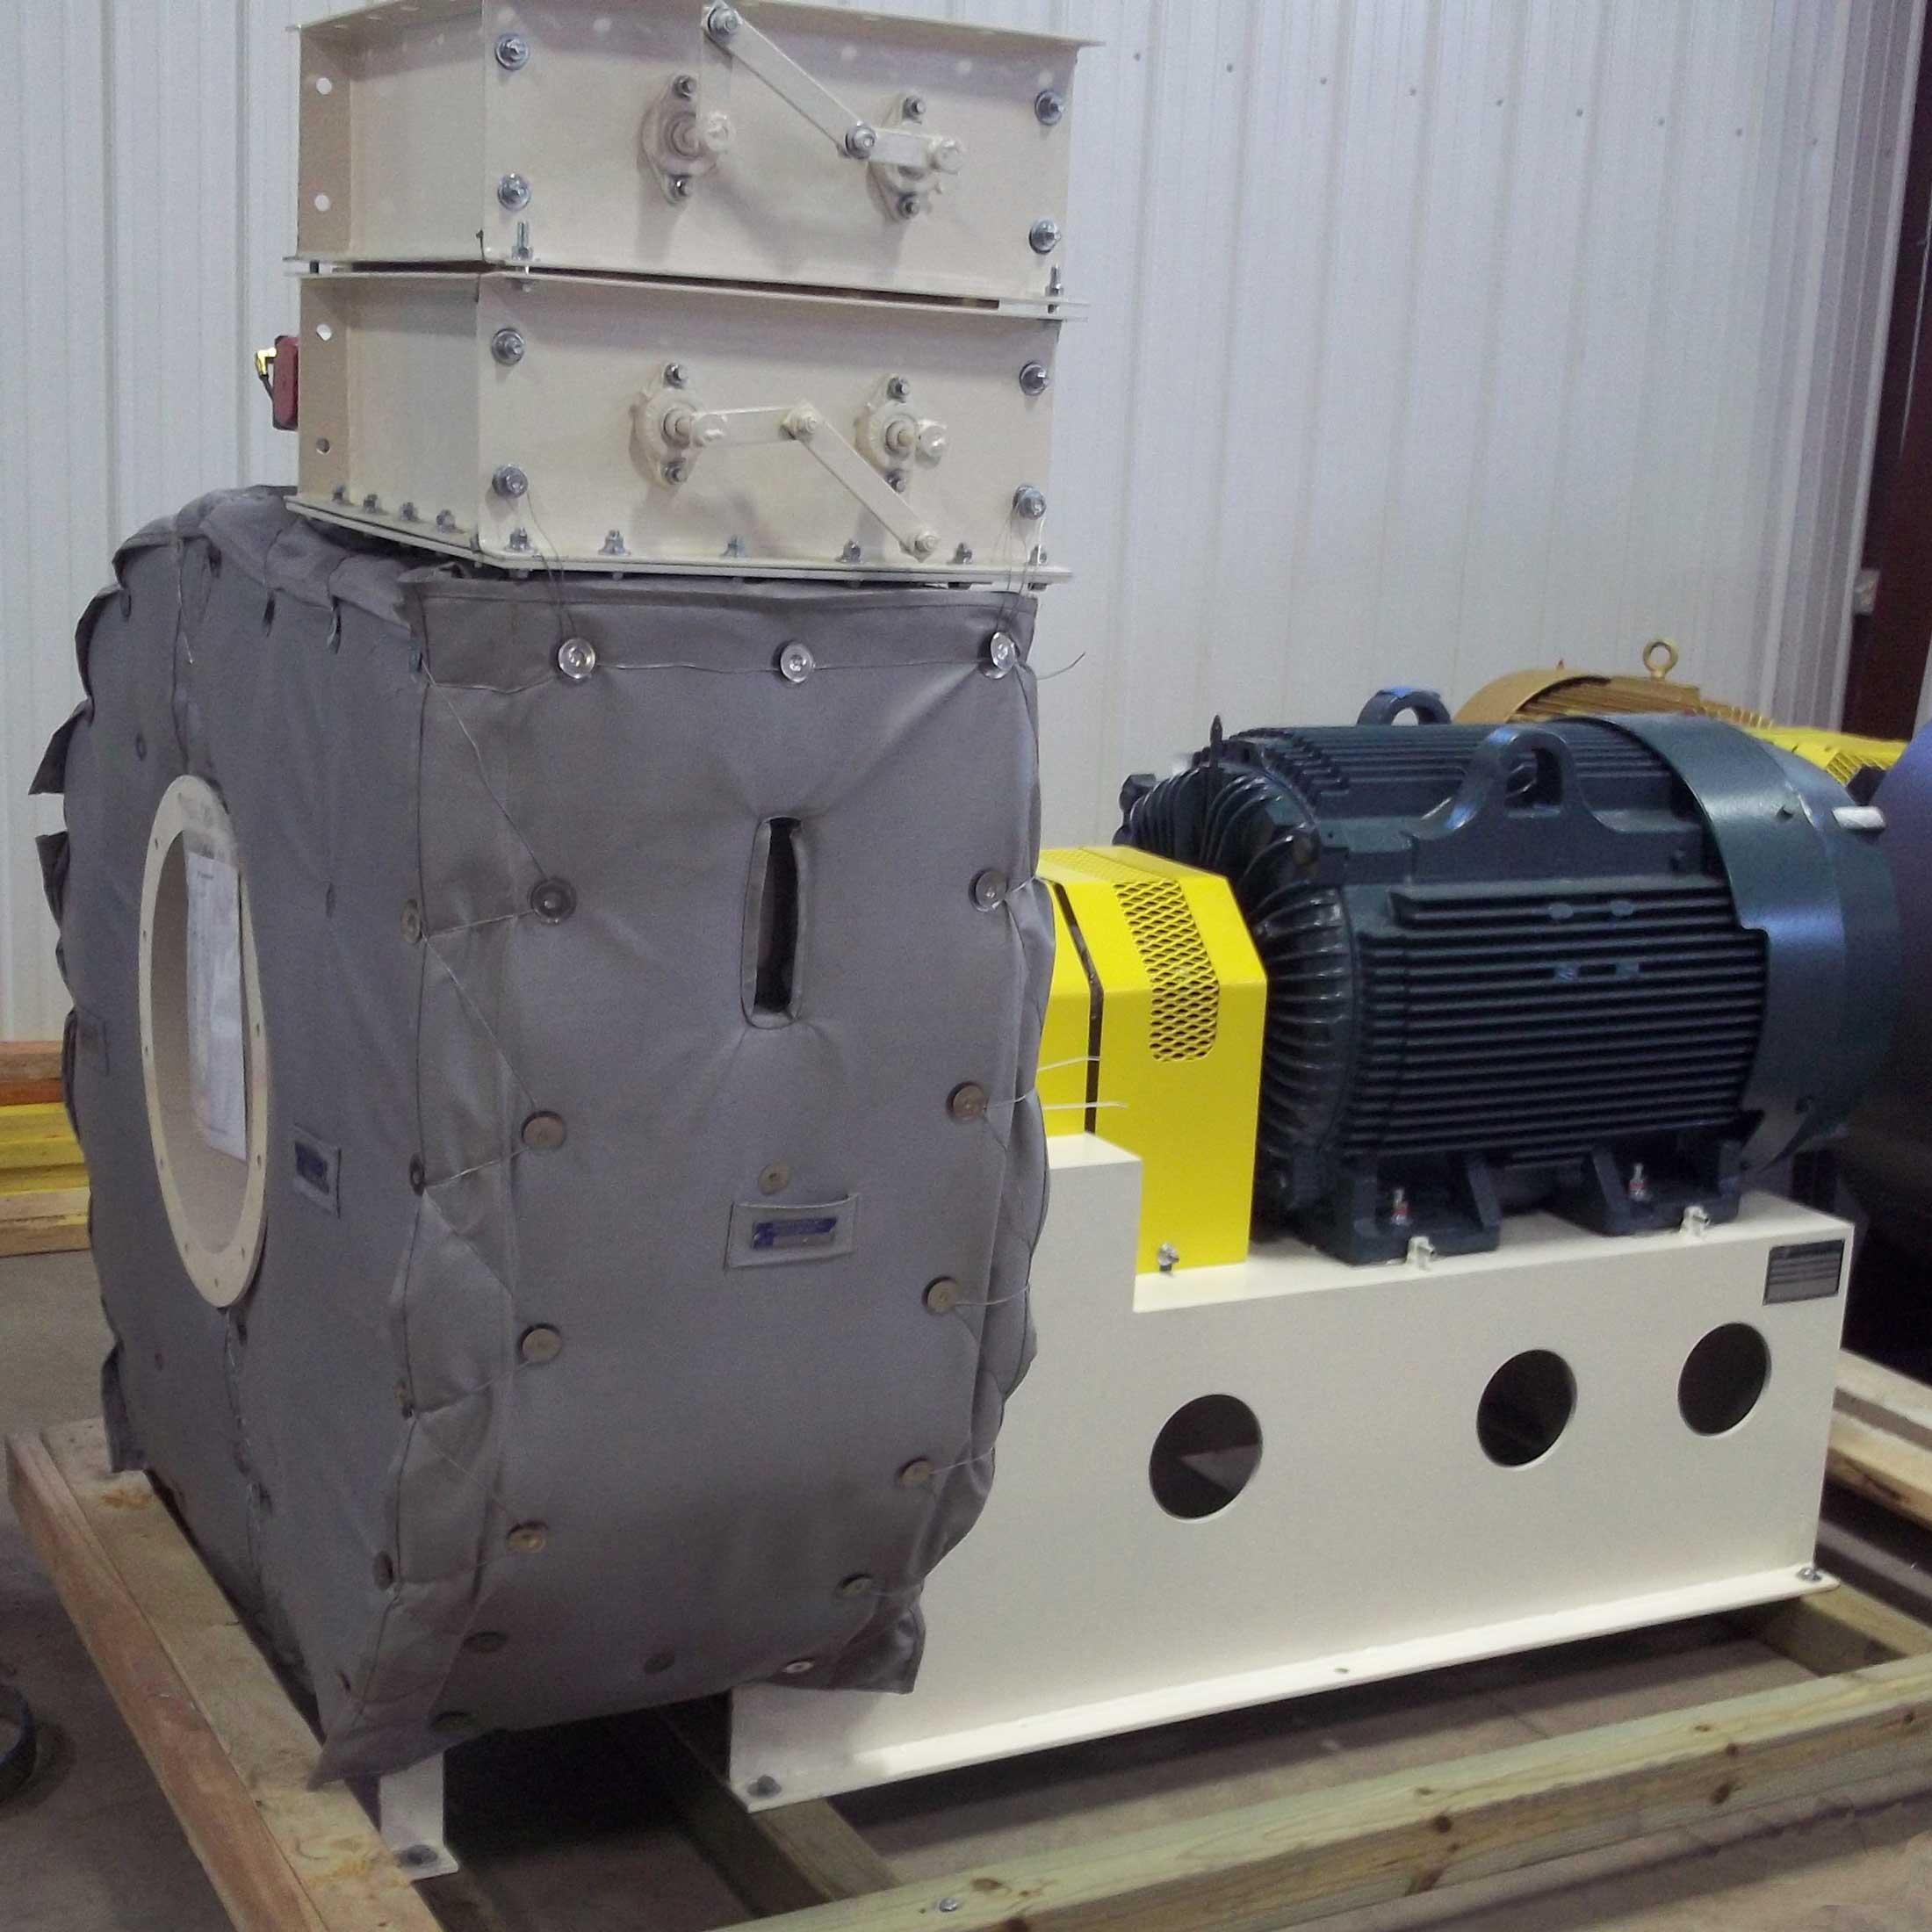 Industrial Exhaust Fans Ventilation : Industrial exhaust fan air handling airpro blower